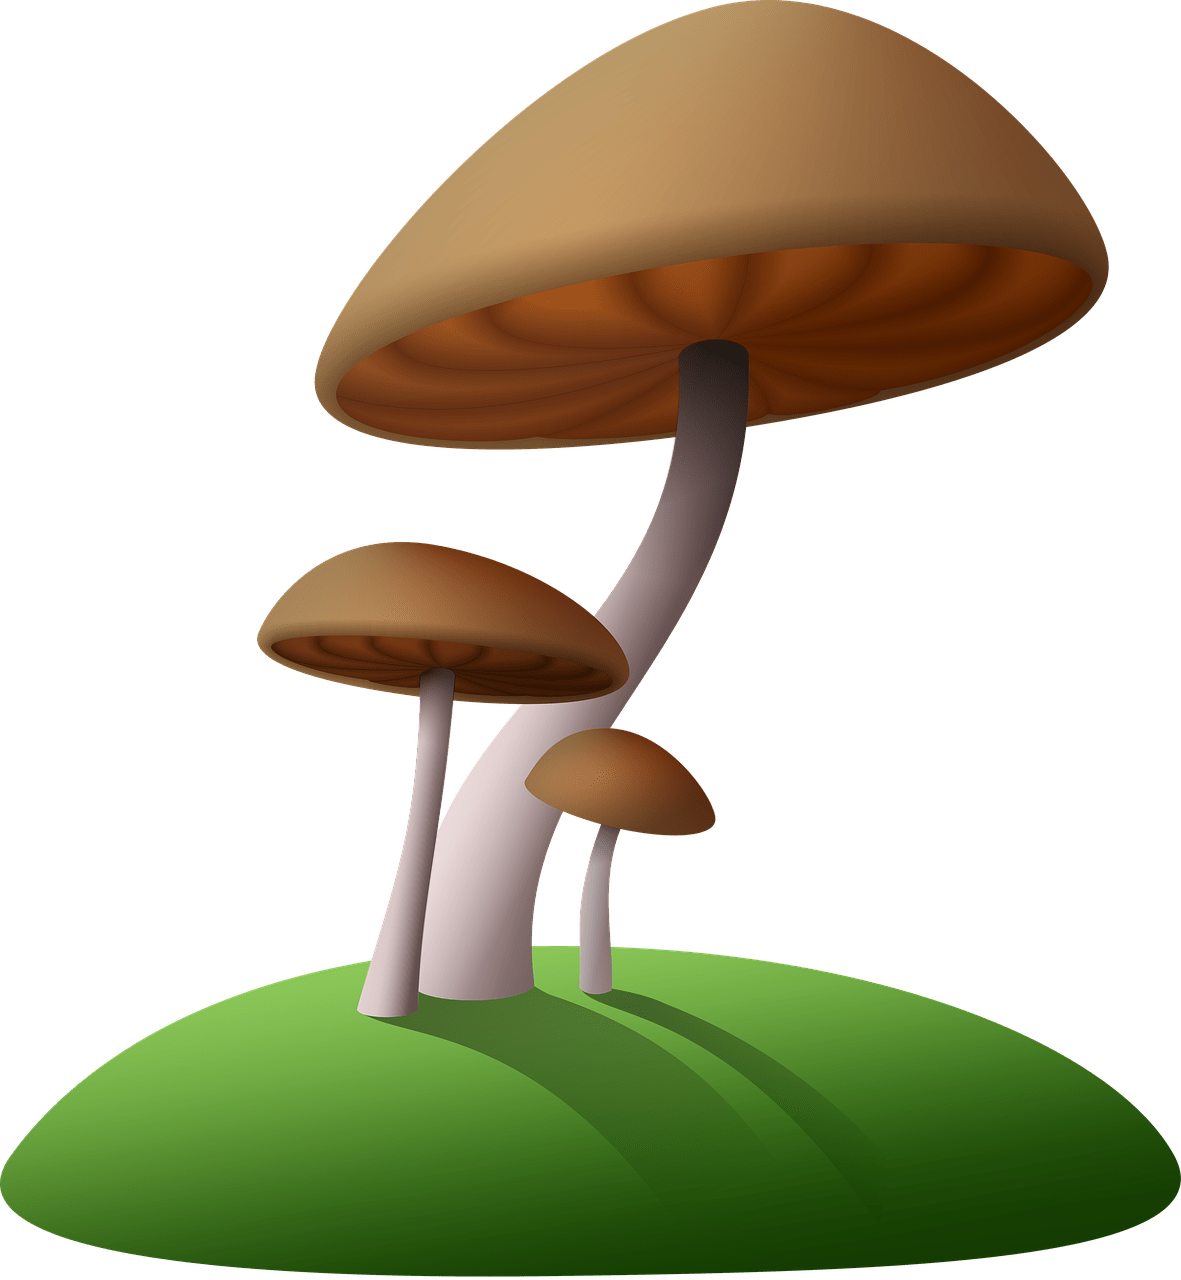 Mushrooms clipart brown mushroom. Transparent png stickpng download